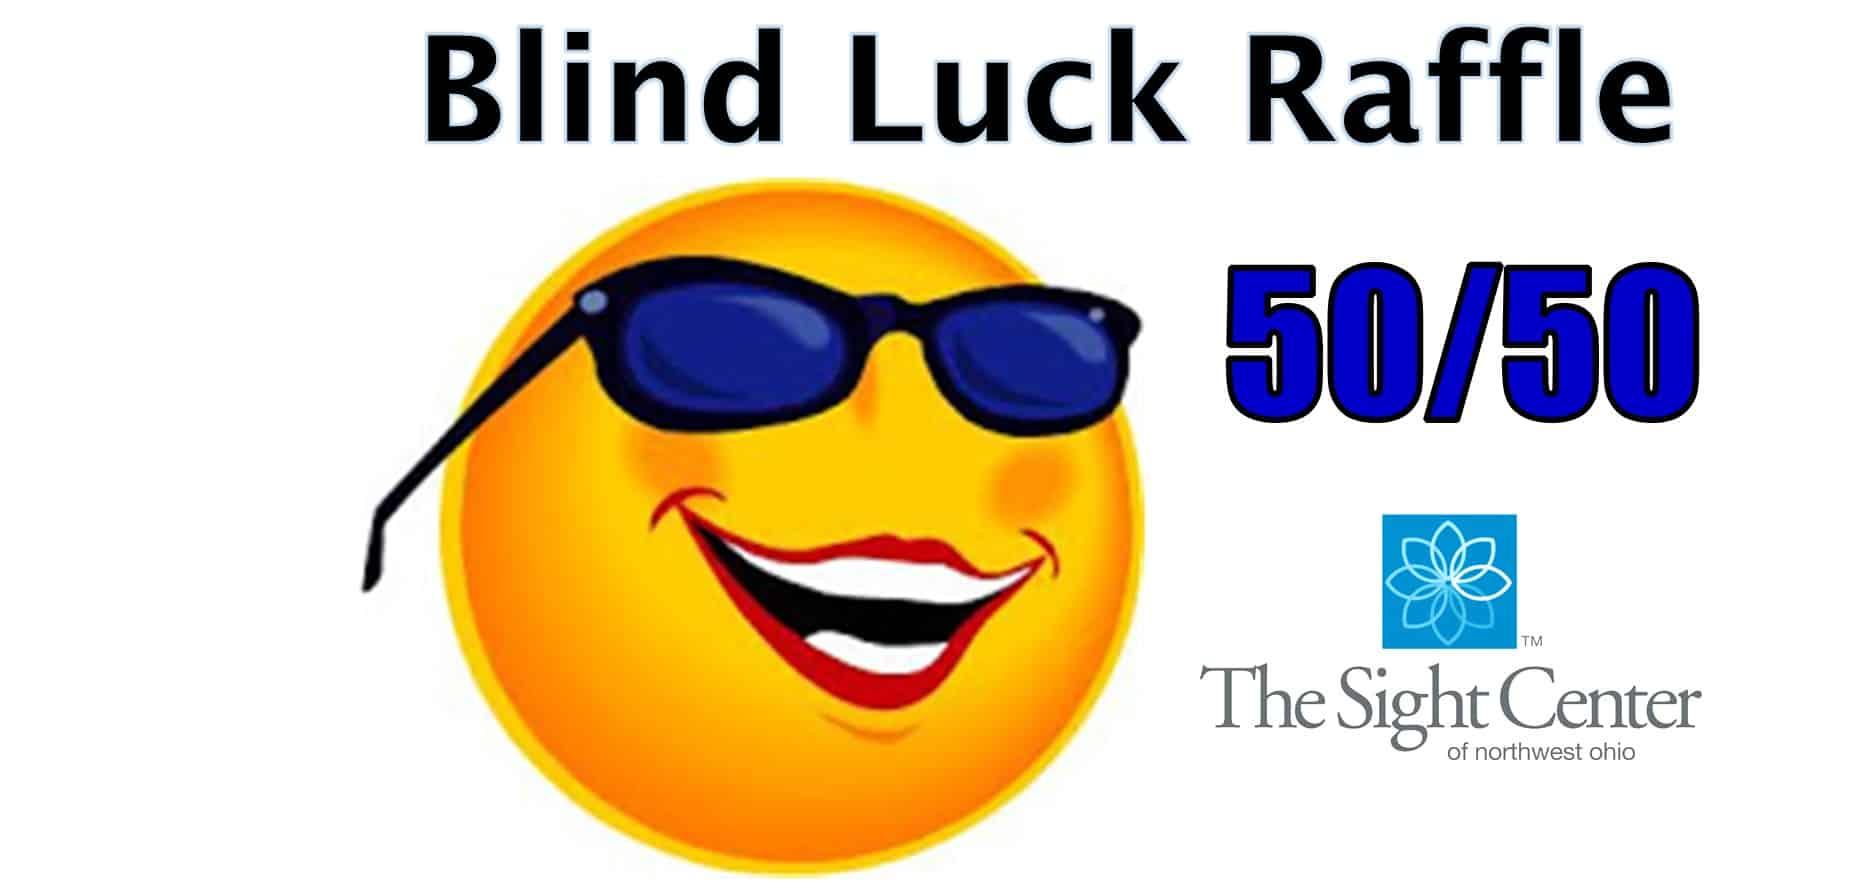 Blind Luck Raffle Header Image